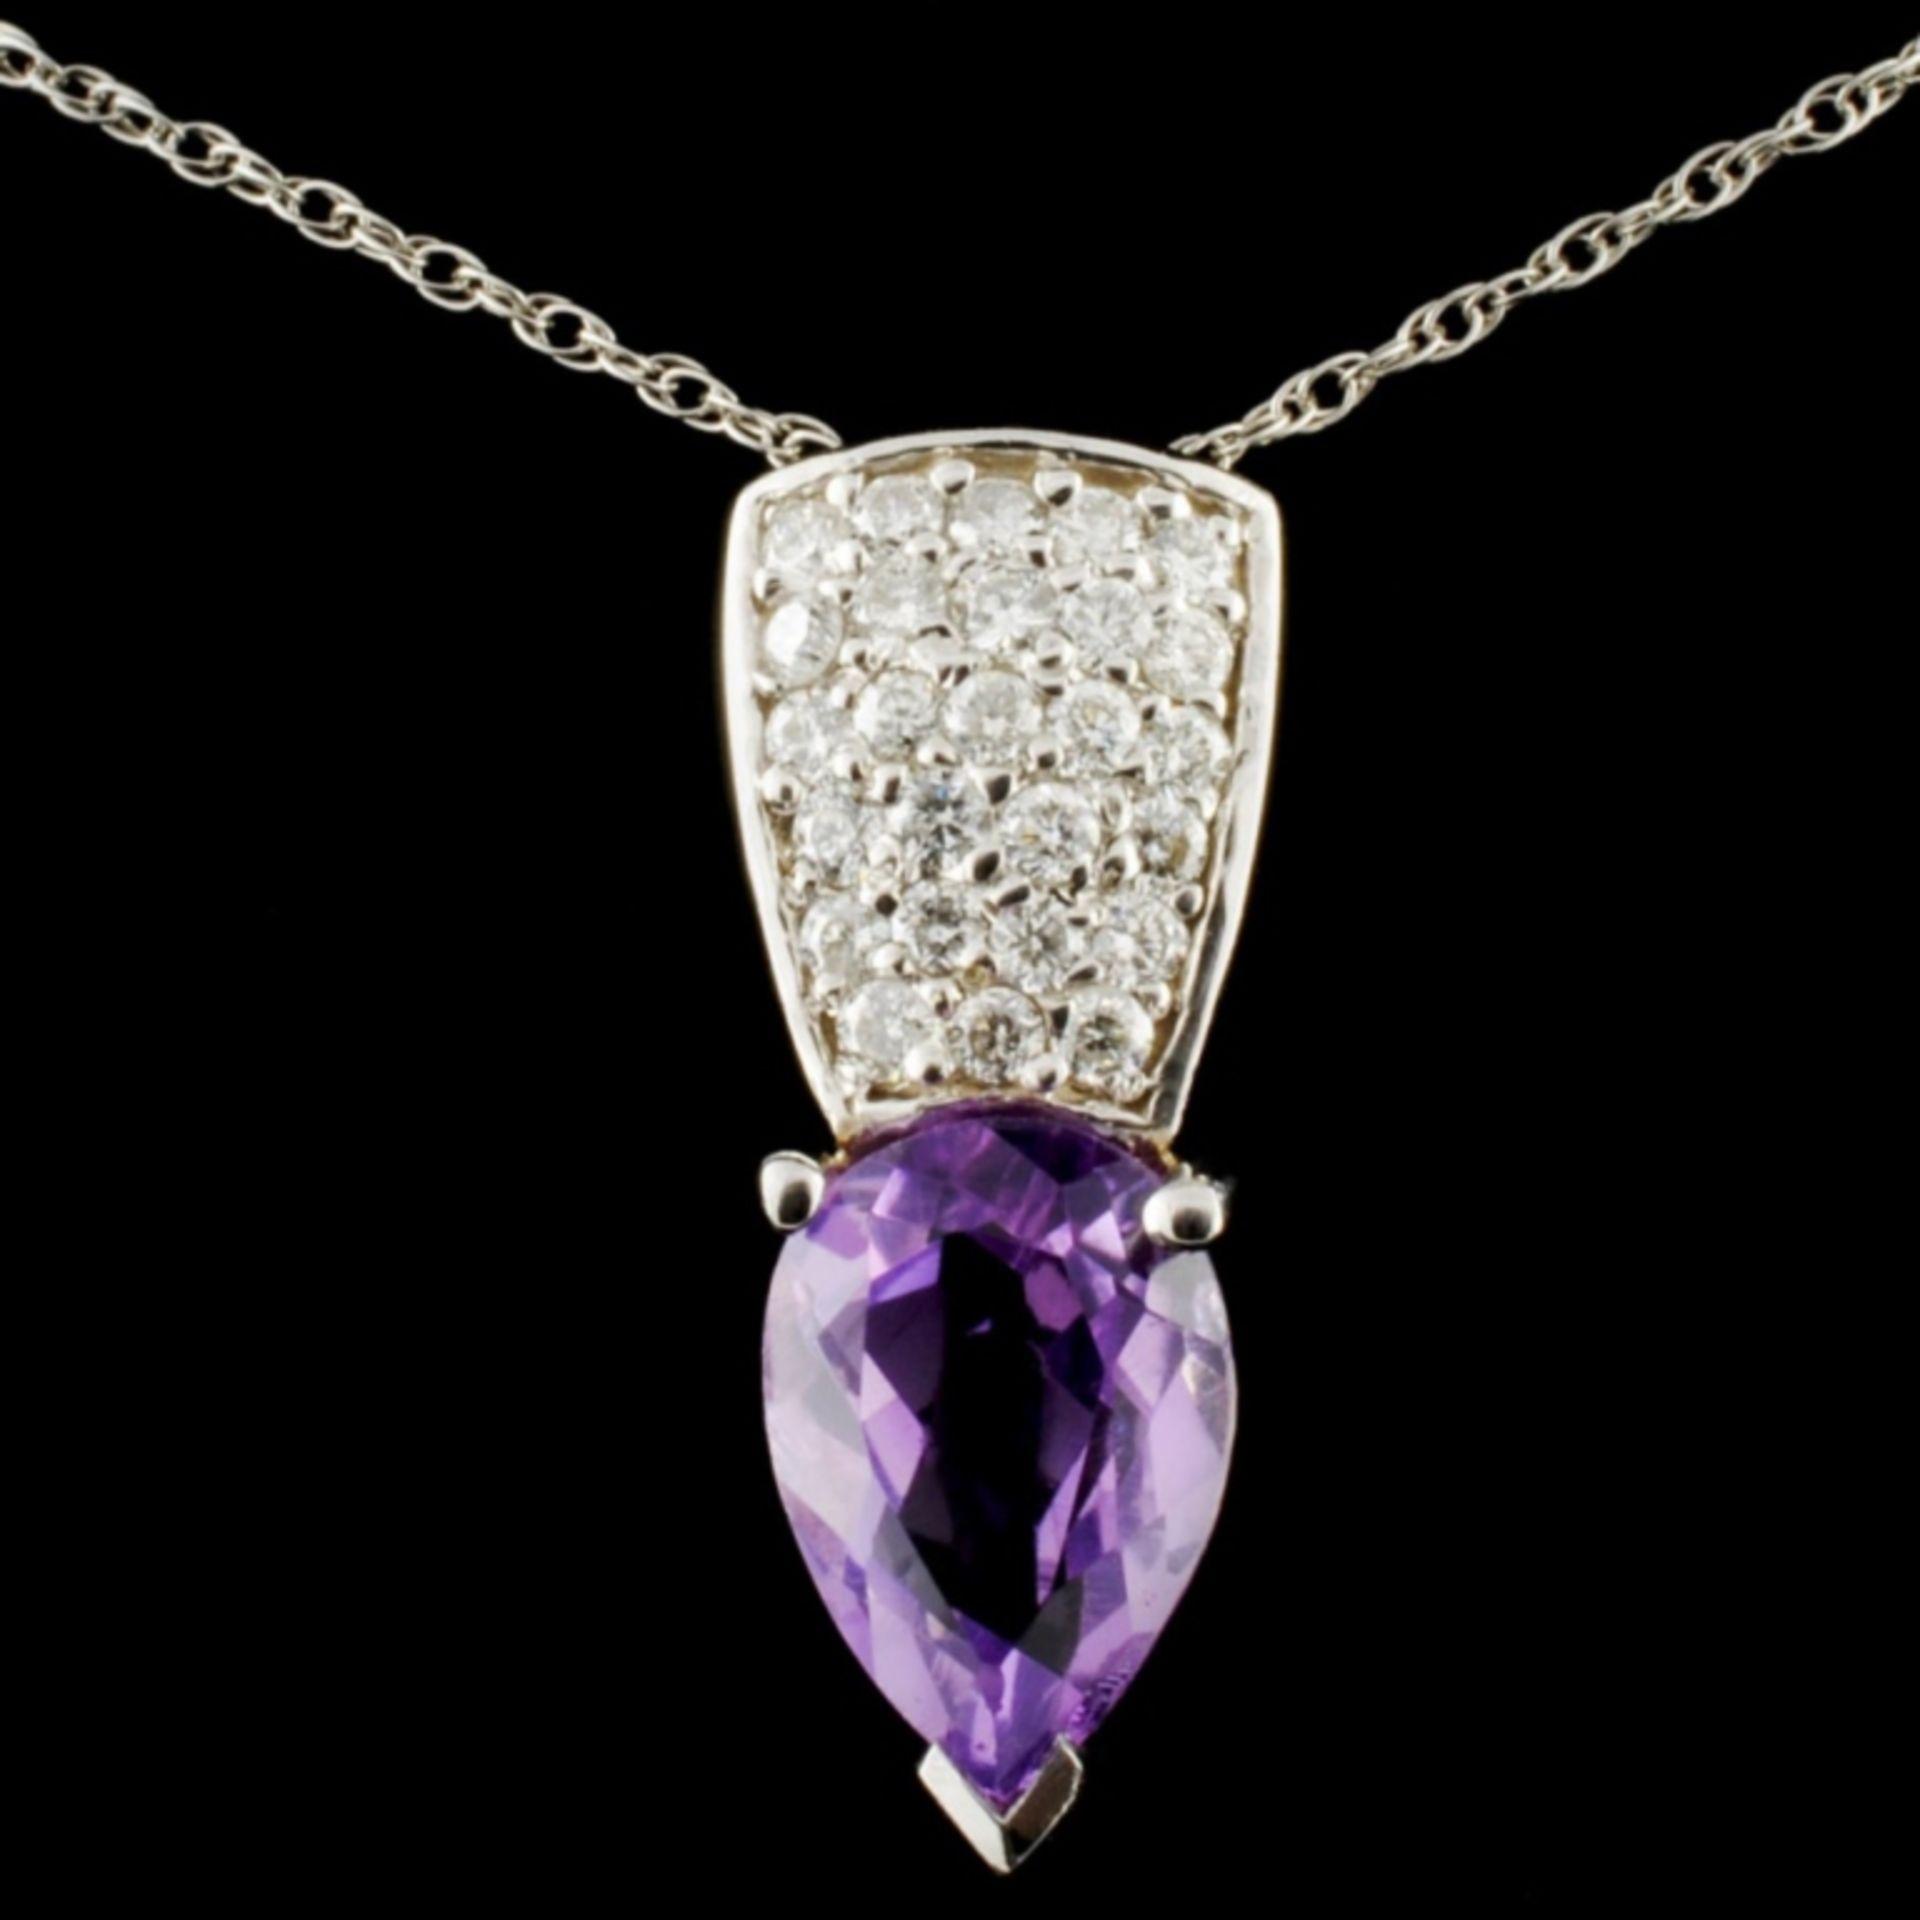 14K Gold 2.30ct Amethyst & 0.60ctw Diamond Pendant